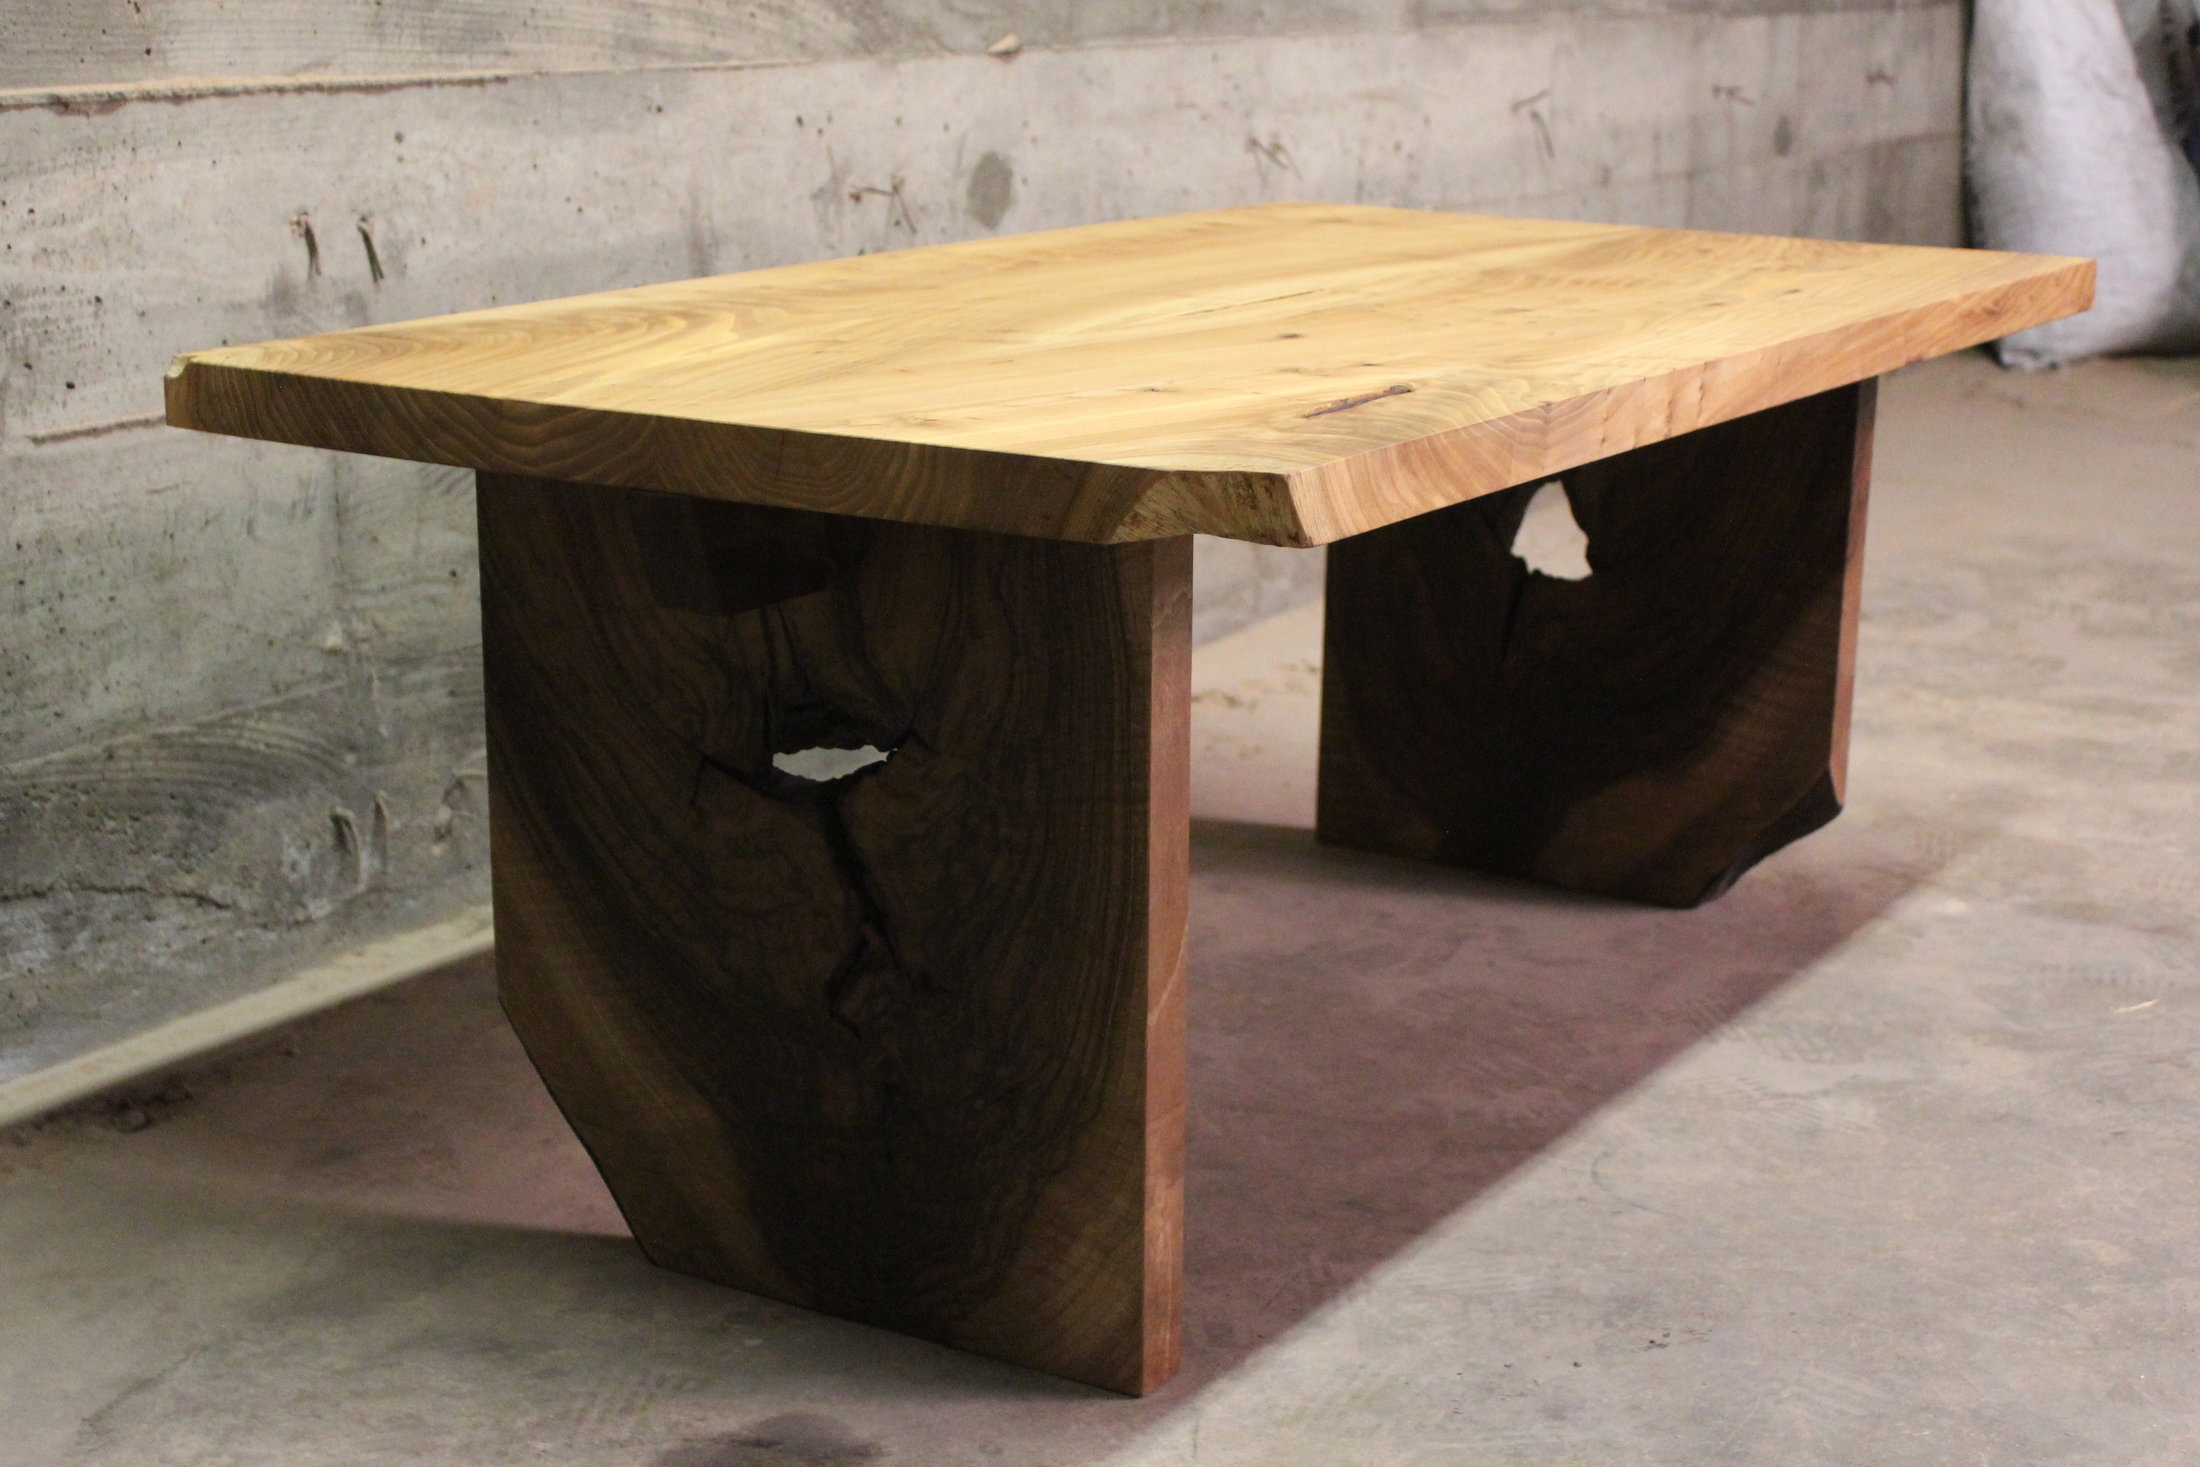 Elm & Walnut Coffee Table - A 45